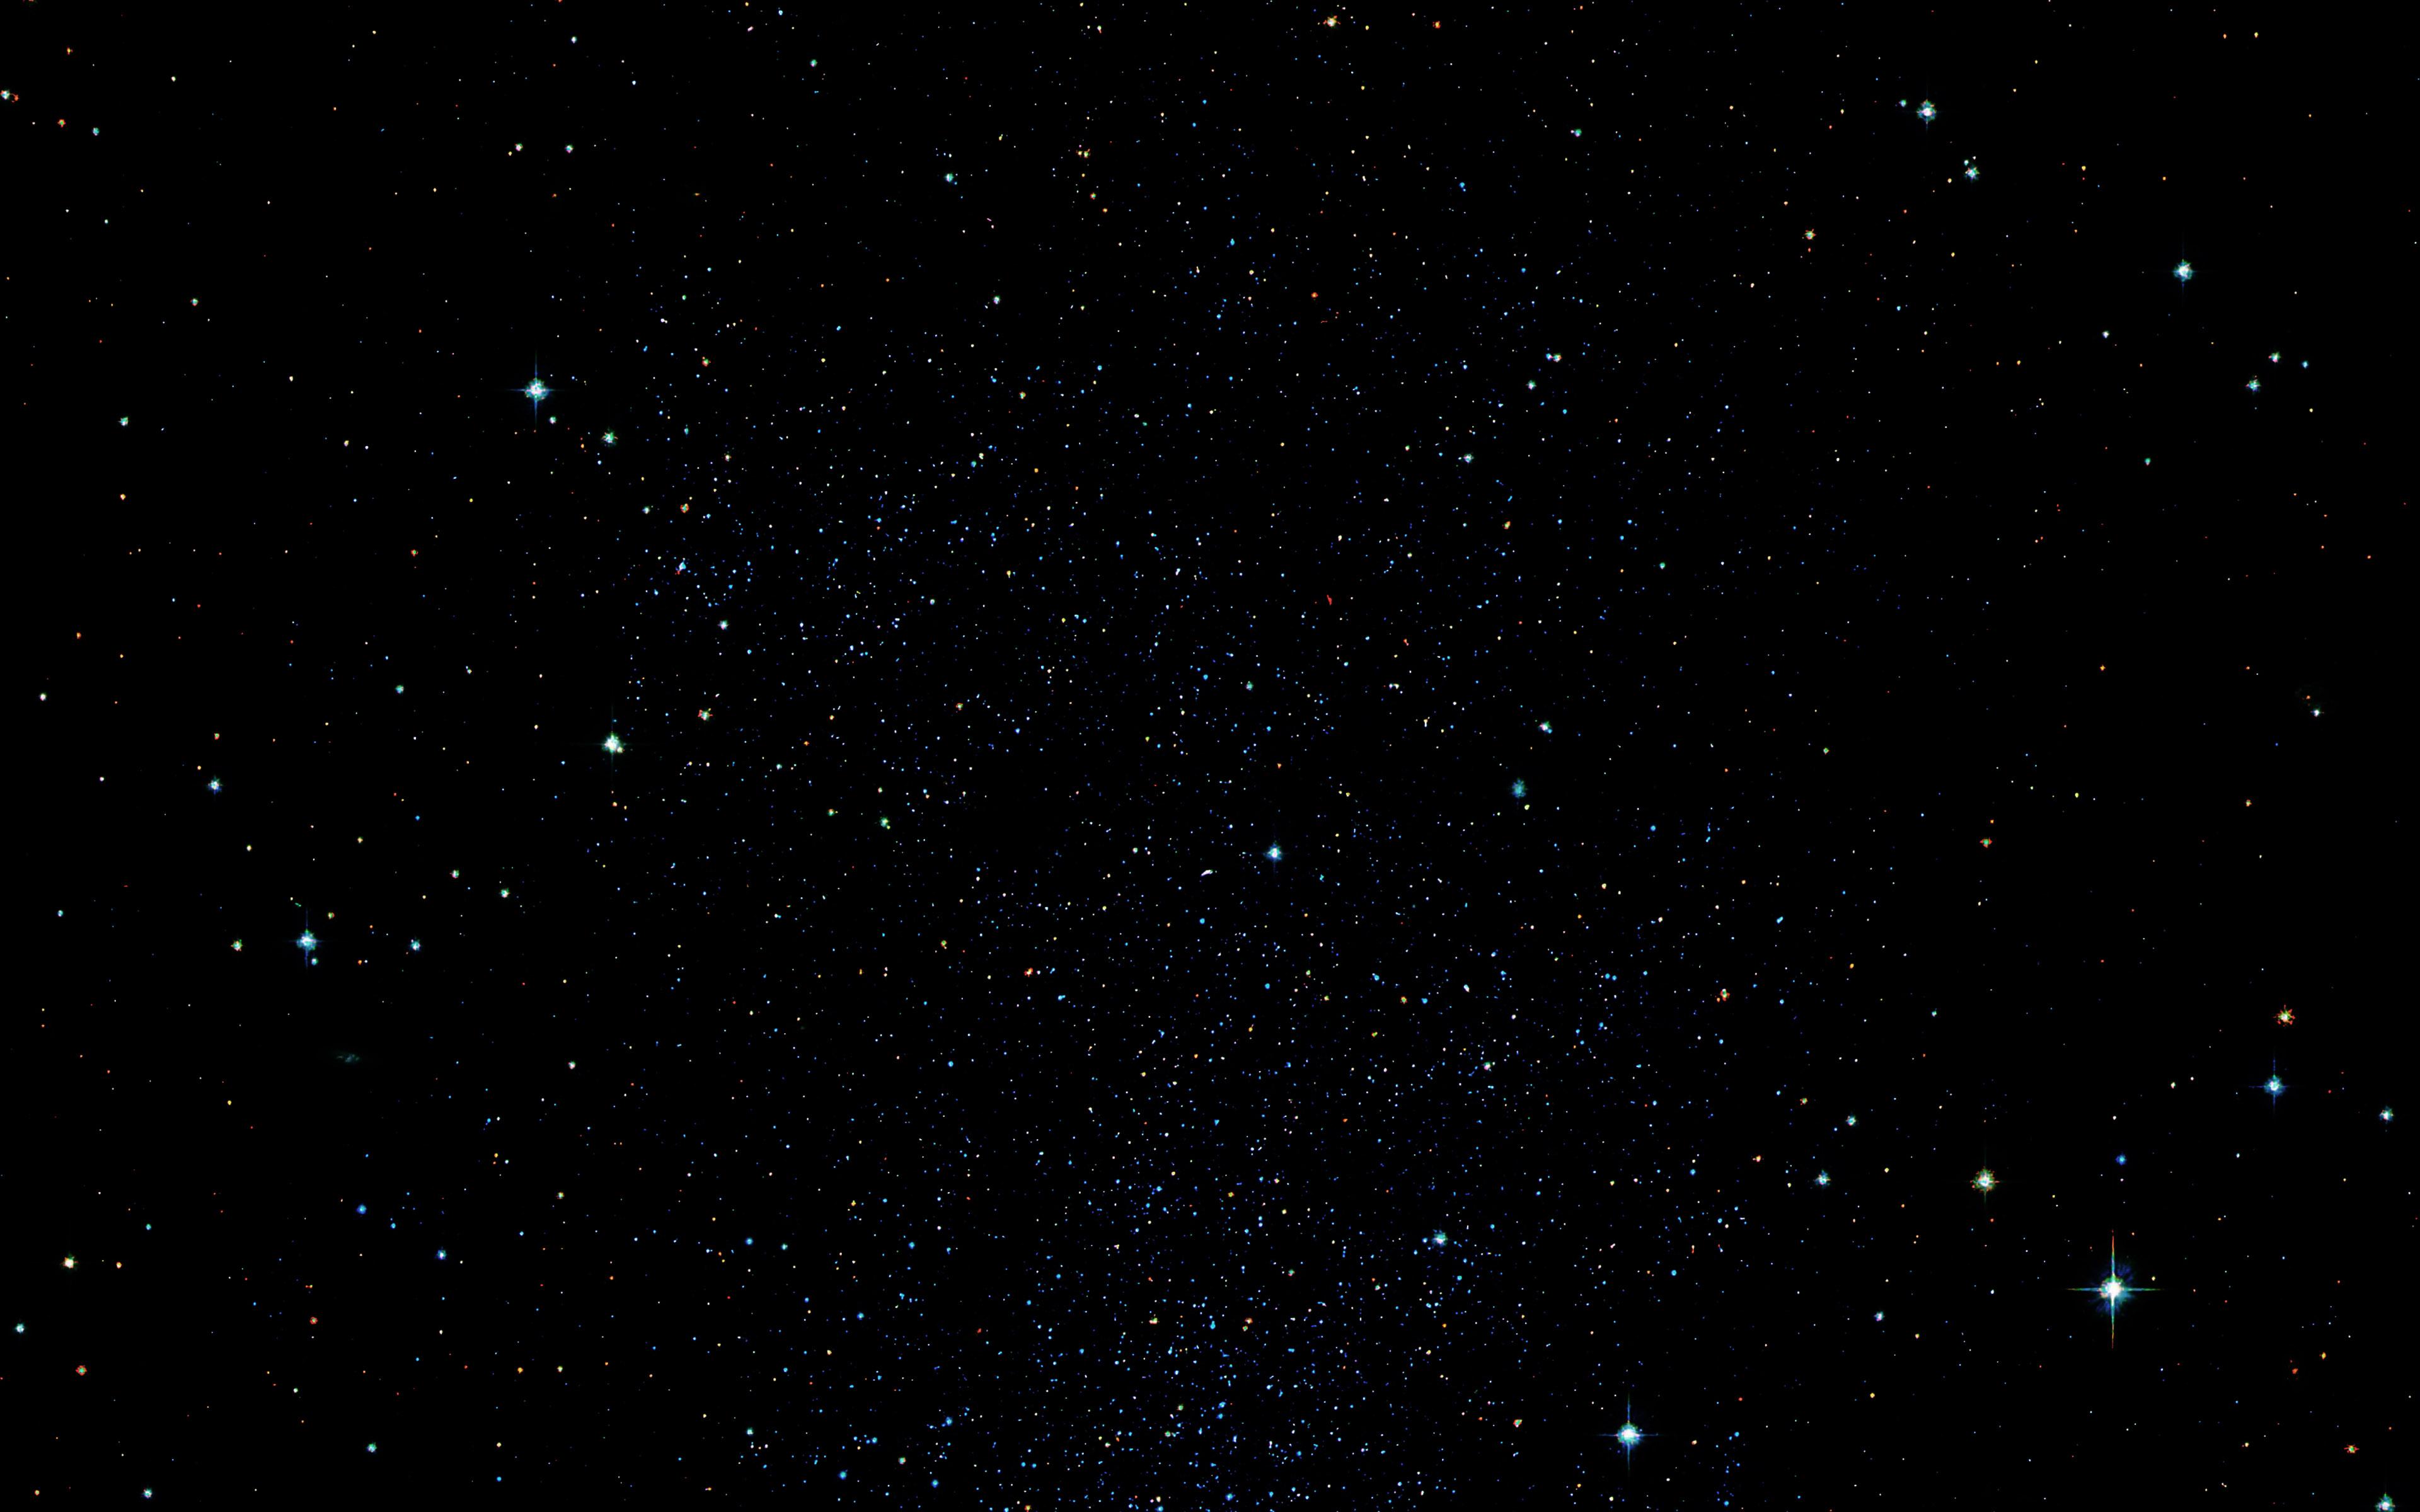 Iphone 5 Fall Wallpaper Md04 Wallpaper Night Space Night Gemini Stars Wallpaper